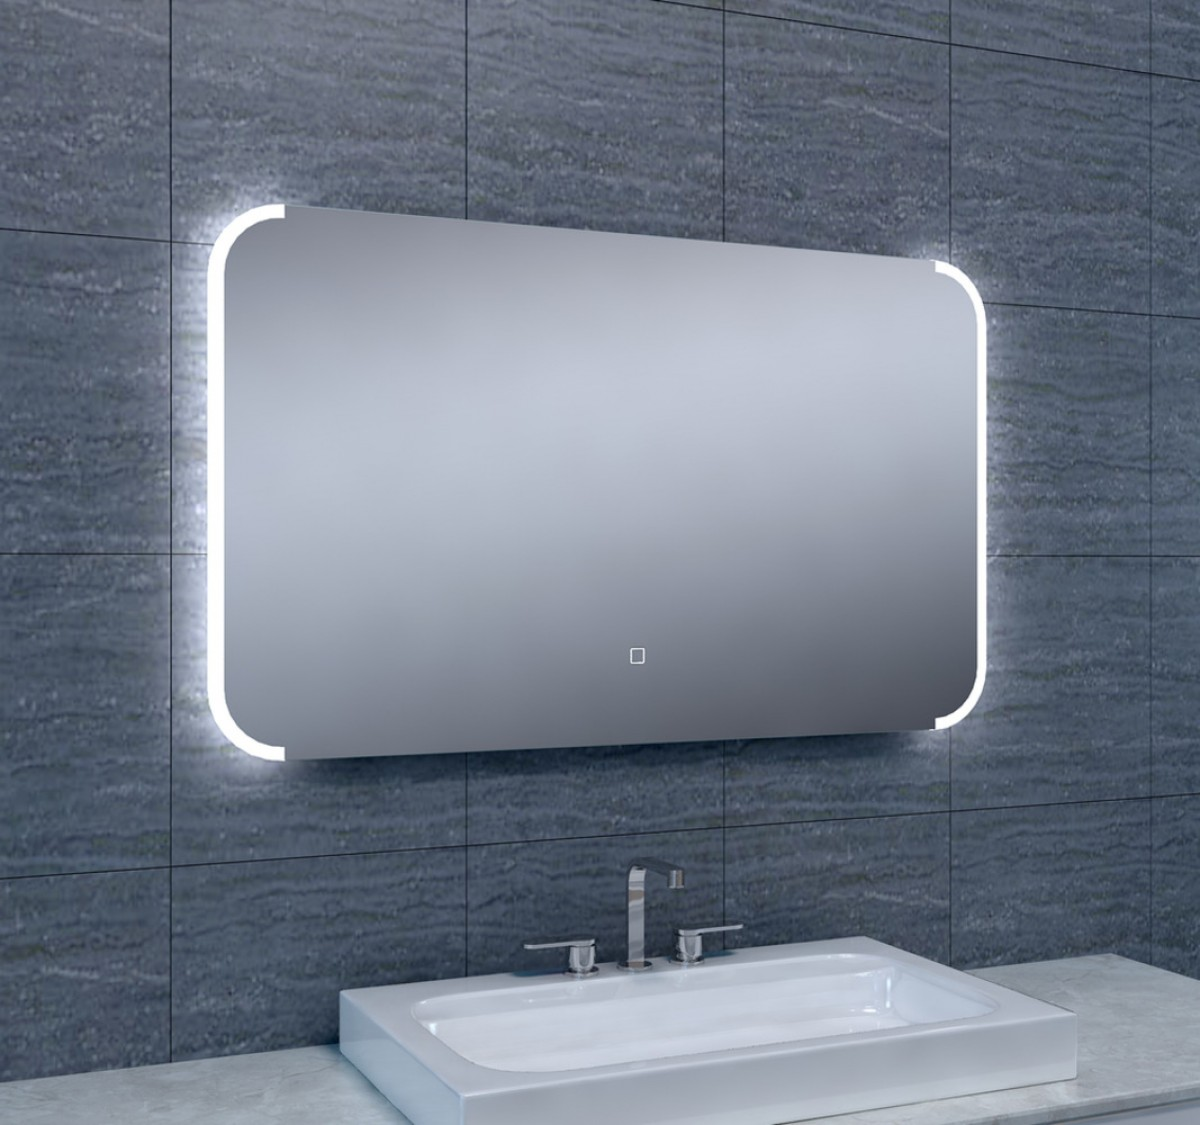 Spiegels in de badkamer | Blog Sanifun